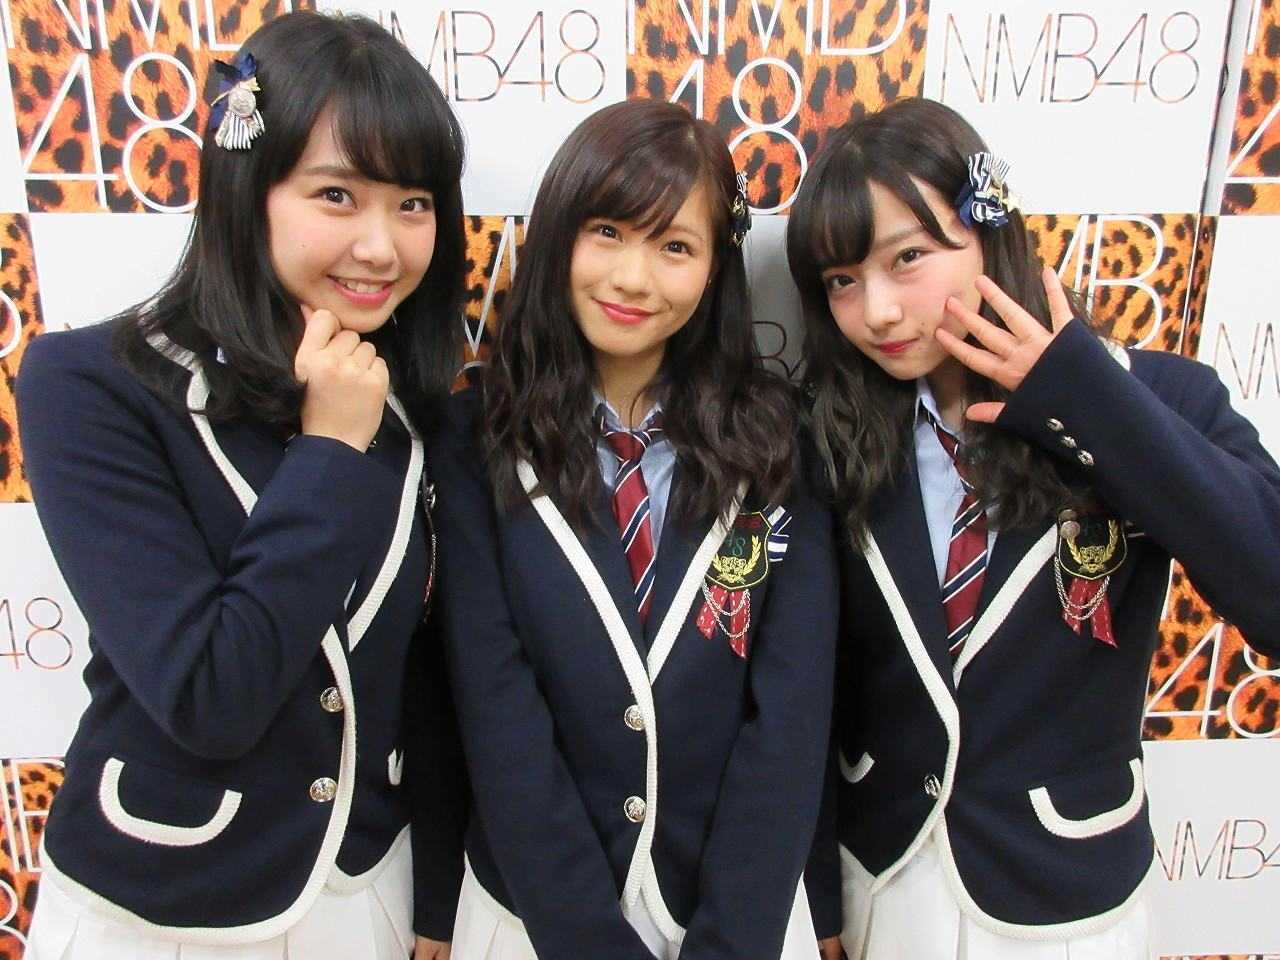 「NMB48」村瀬紗英・谷川愛梨・加藤夕夏の個性溢れるキャラクターを徹底検証!ワロタエピソード付き!【インタビュー】